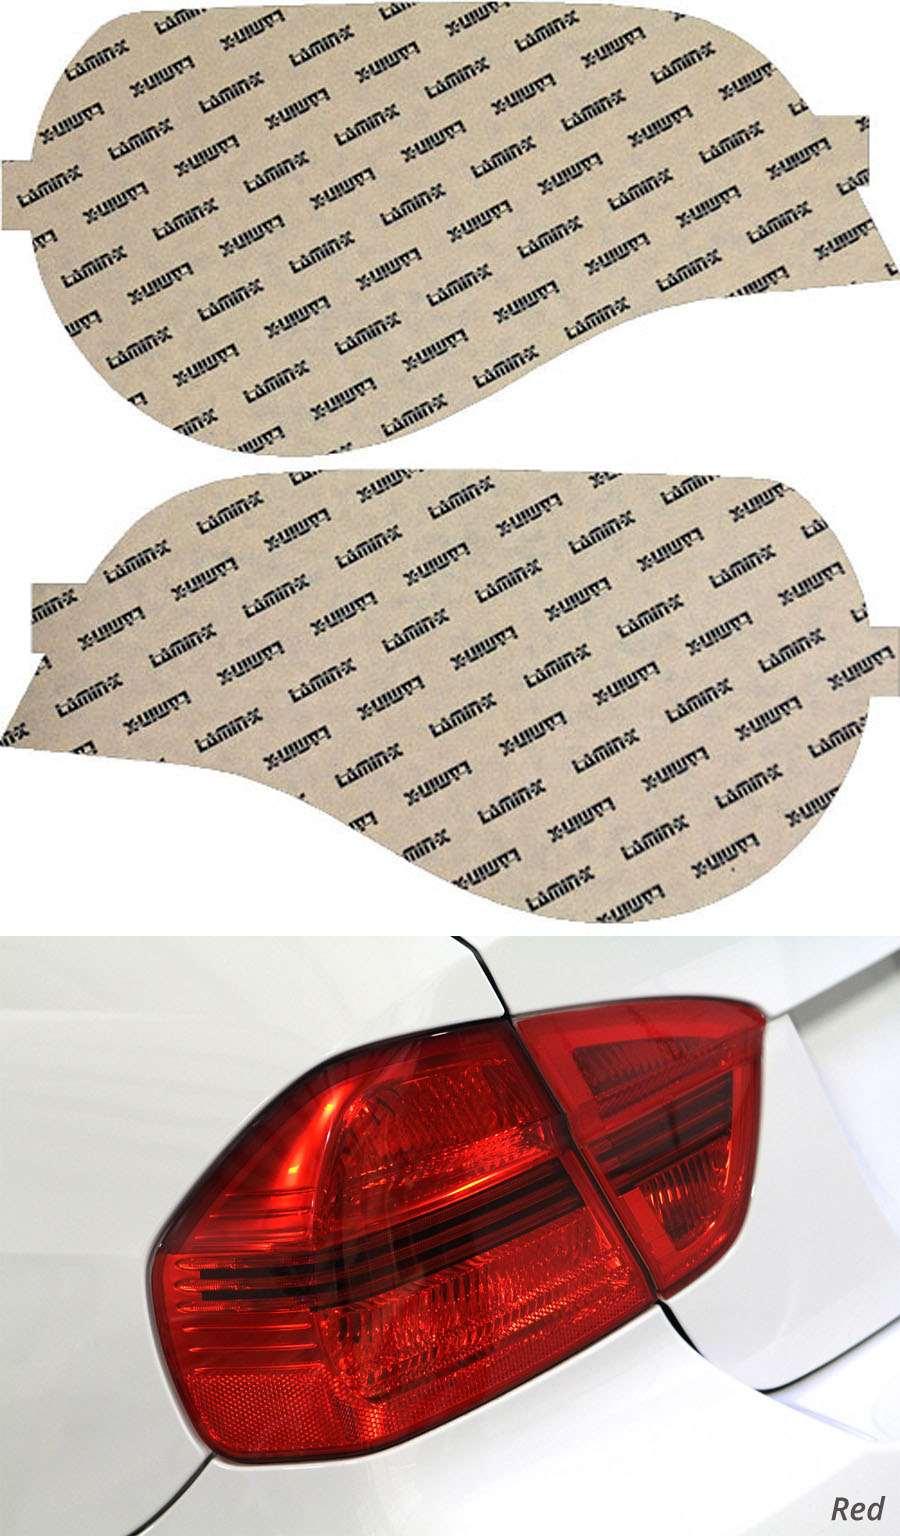 BMW Z4 & Z4M 06-08 Red Tail Light Covers Lamin-X B209R